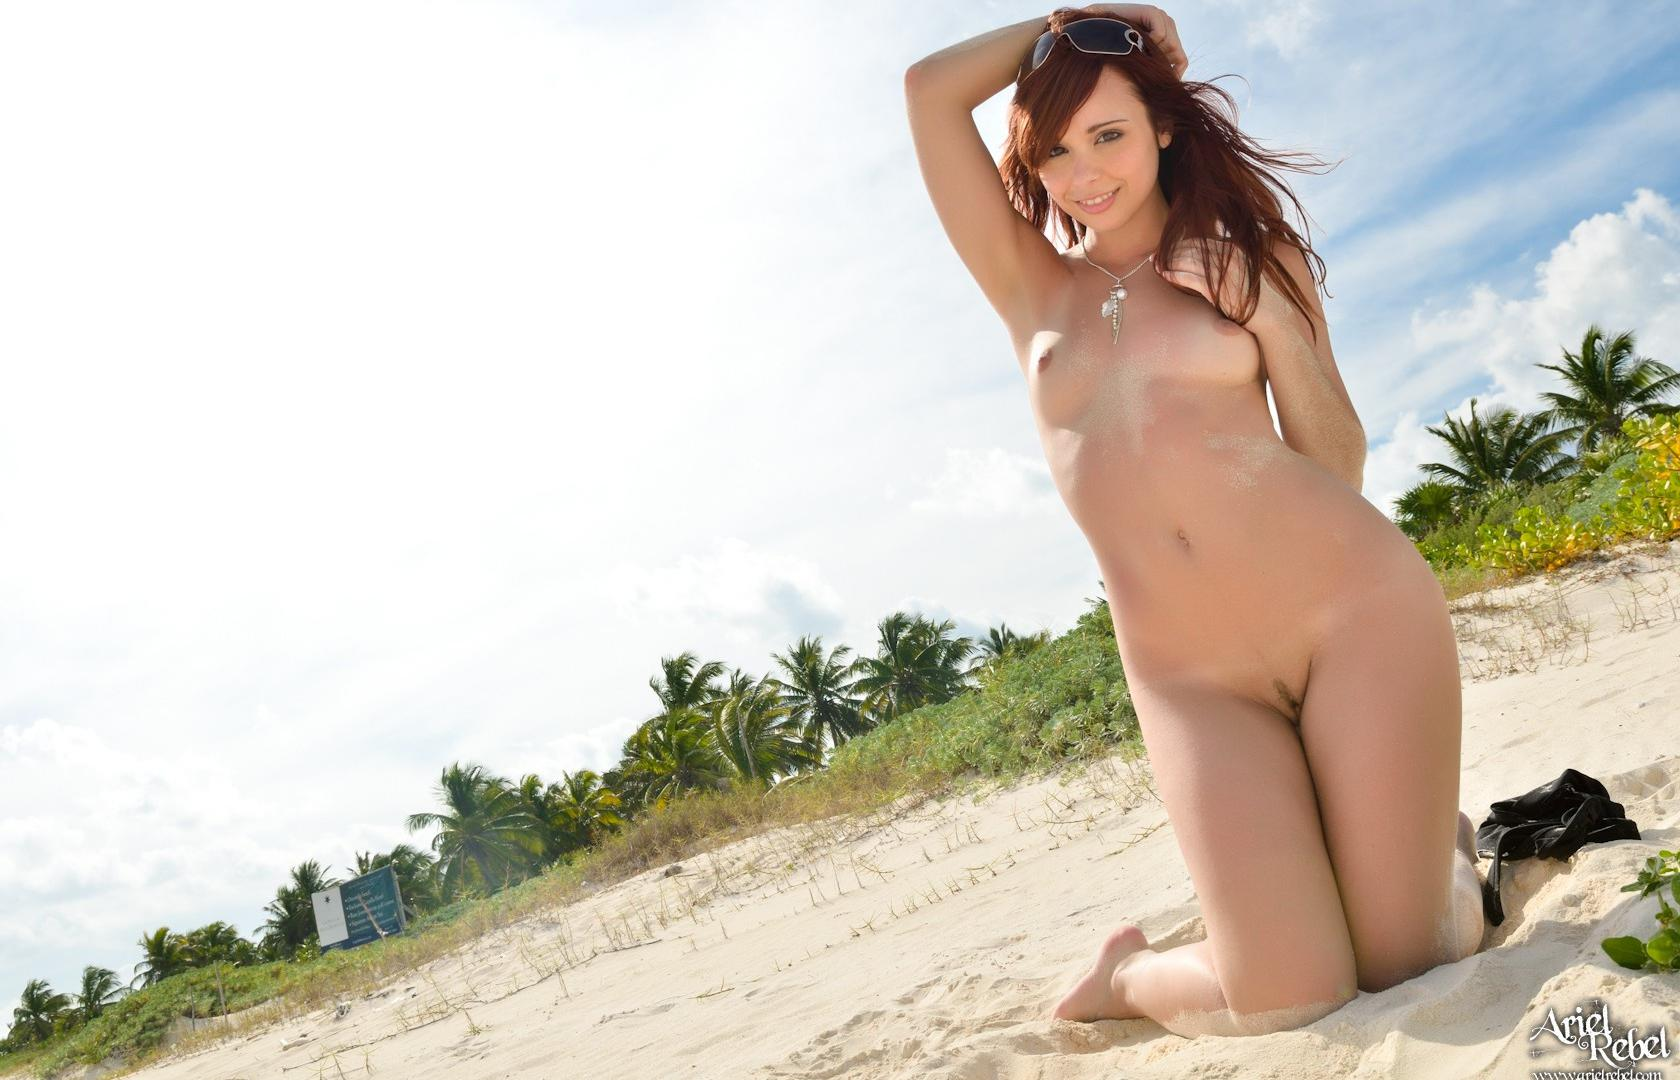 Ariel Rebel Tits 48